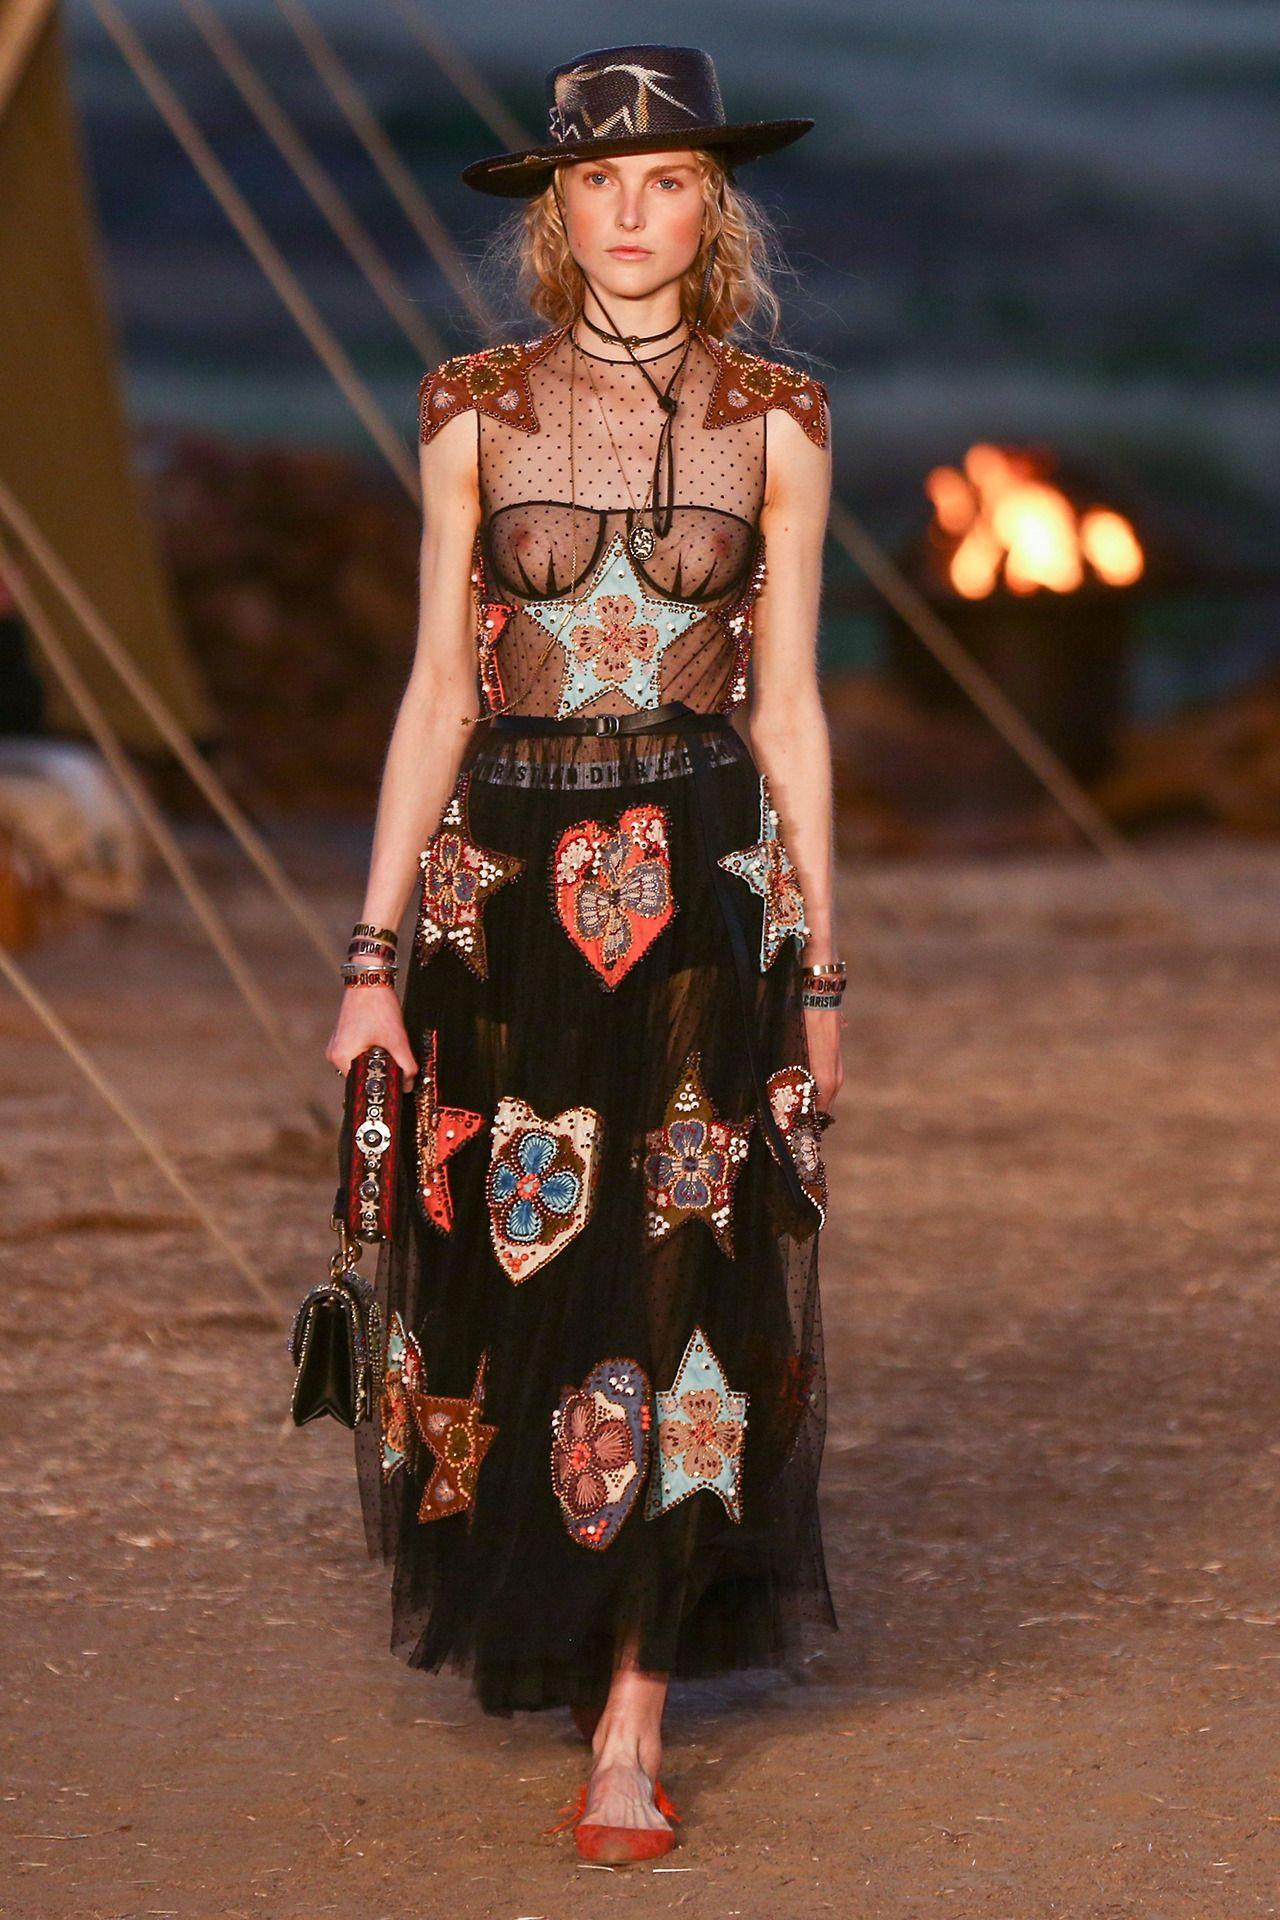 Metallic Minimalistic Fashion // Dior Sunglasses. Georg